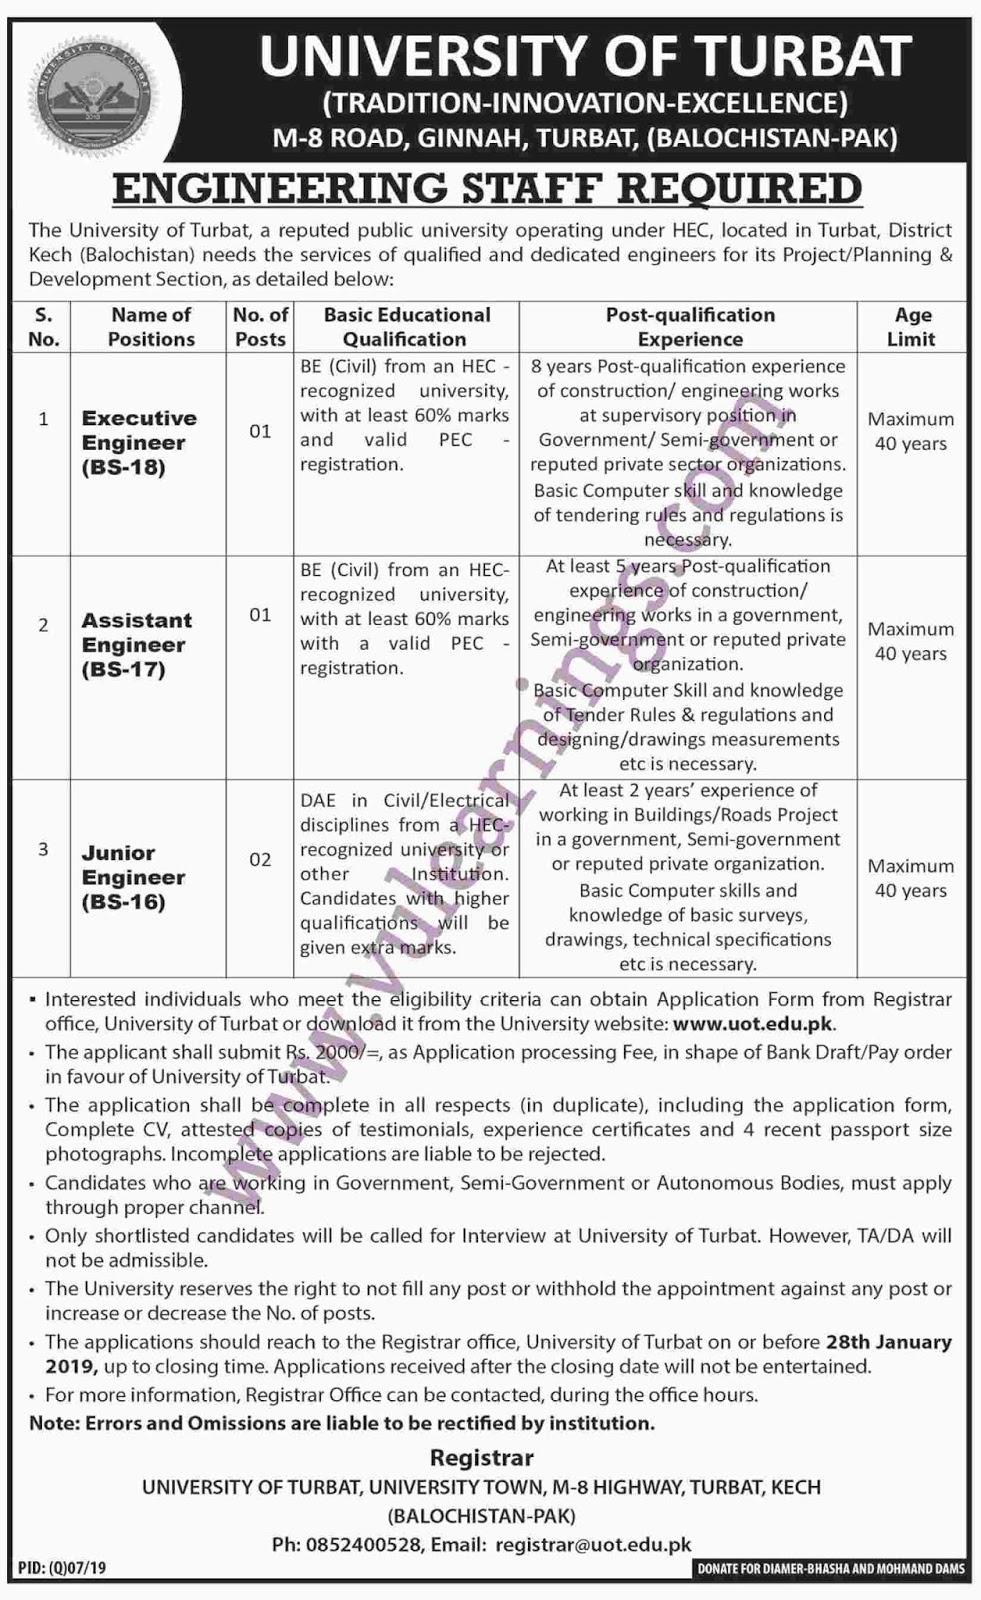 University of Turbat Engineering Staff Required